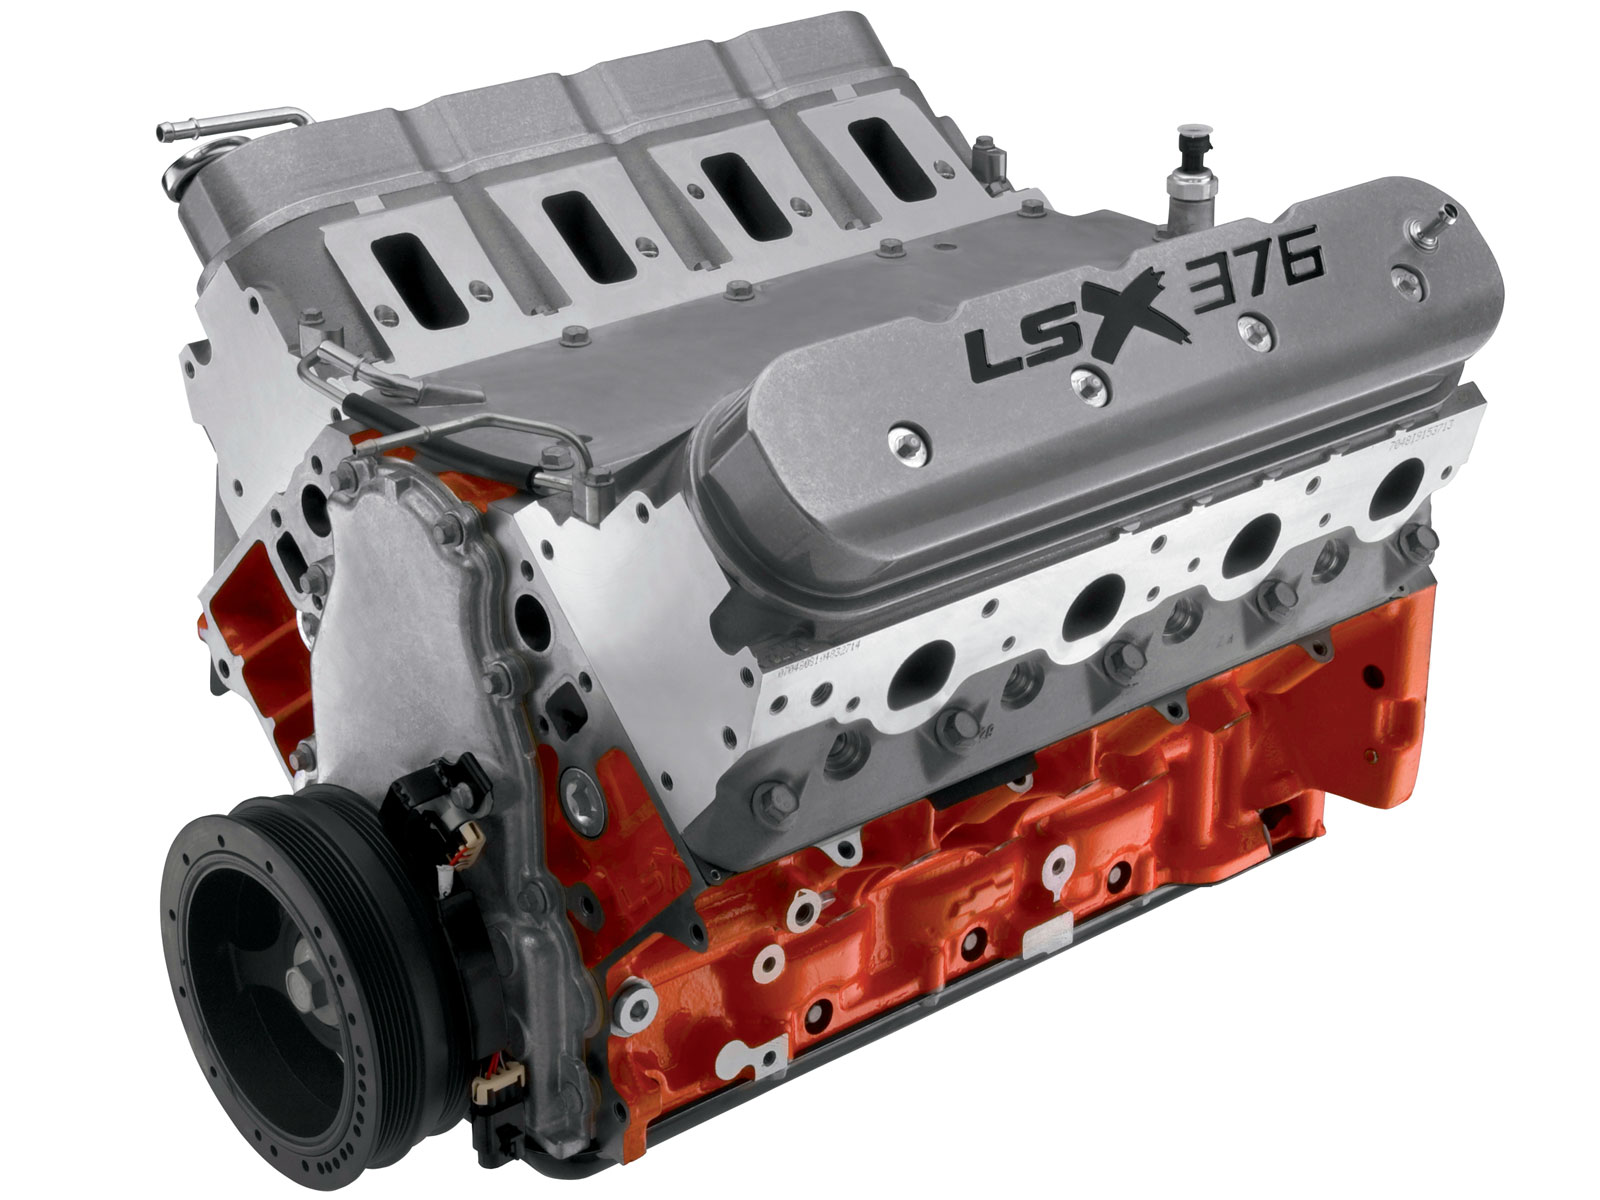 Truck Engines 1998 Gmc K3500 Pickup Engine Rebuilt